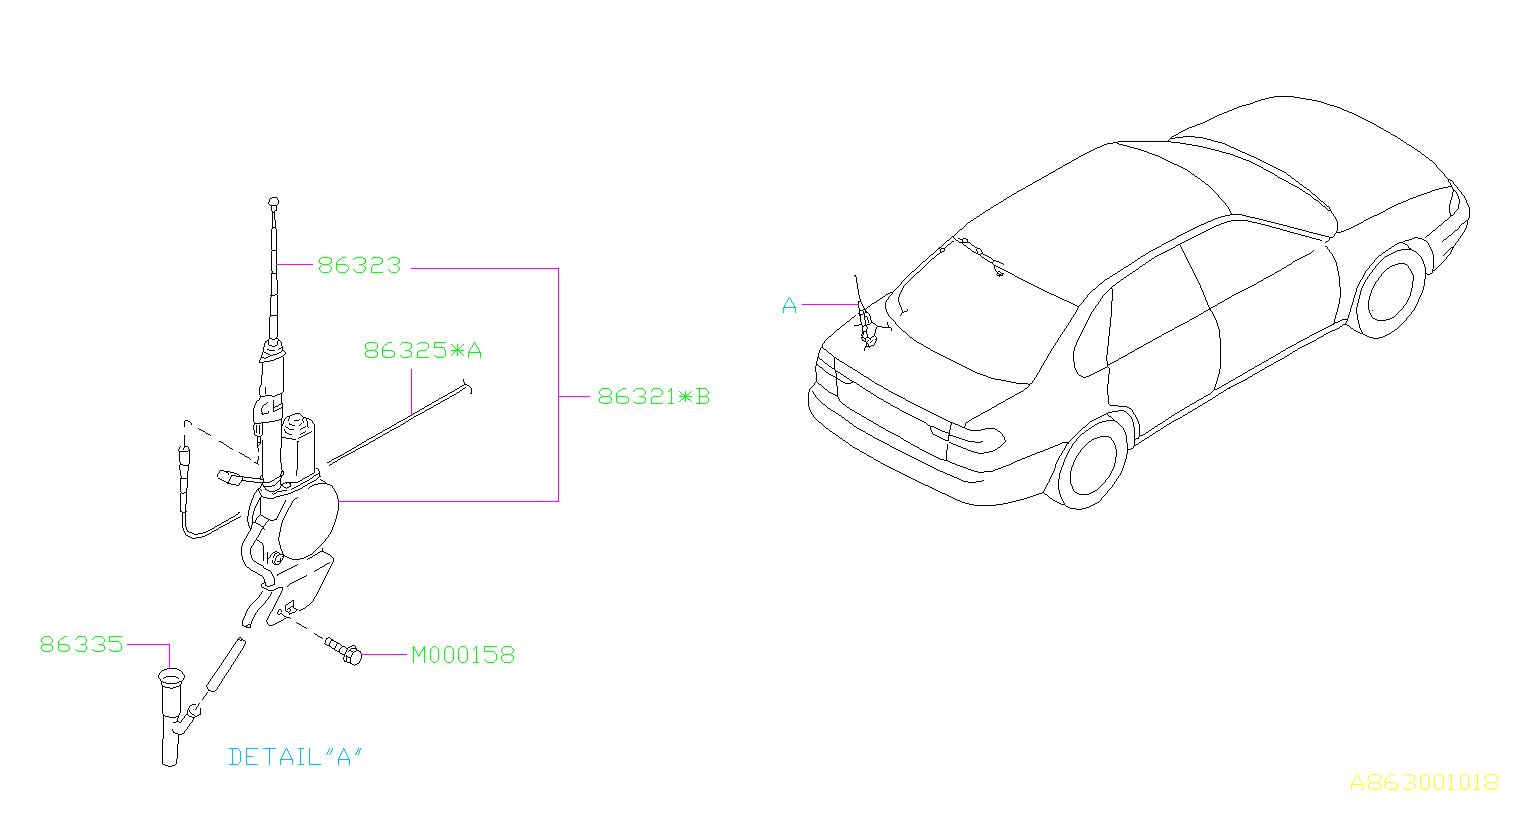 Subaru Legacy Rod & nut assembly-antenna. Auto, audio